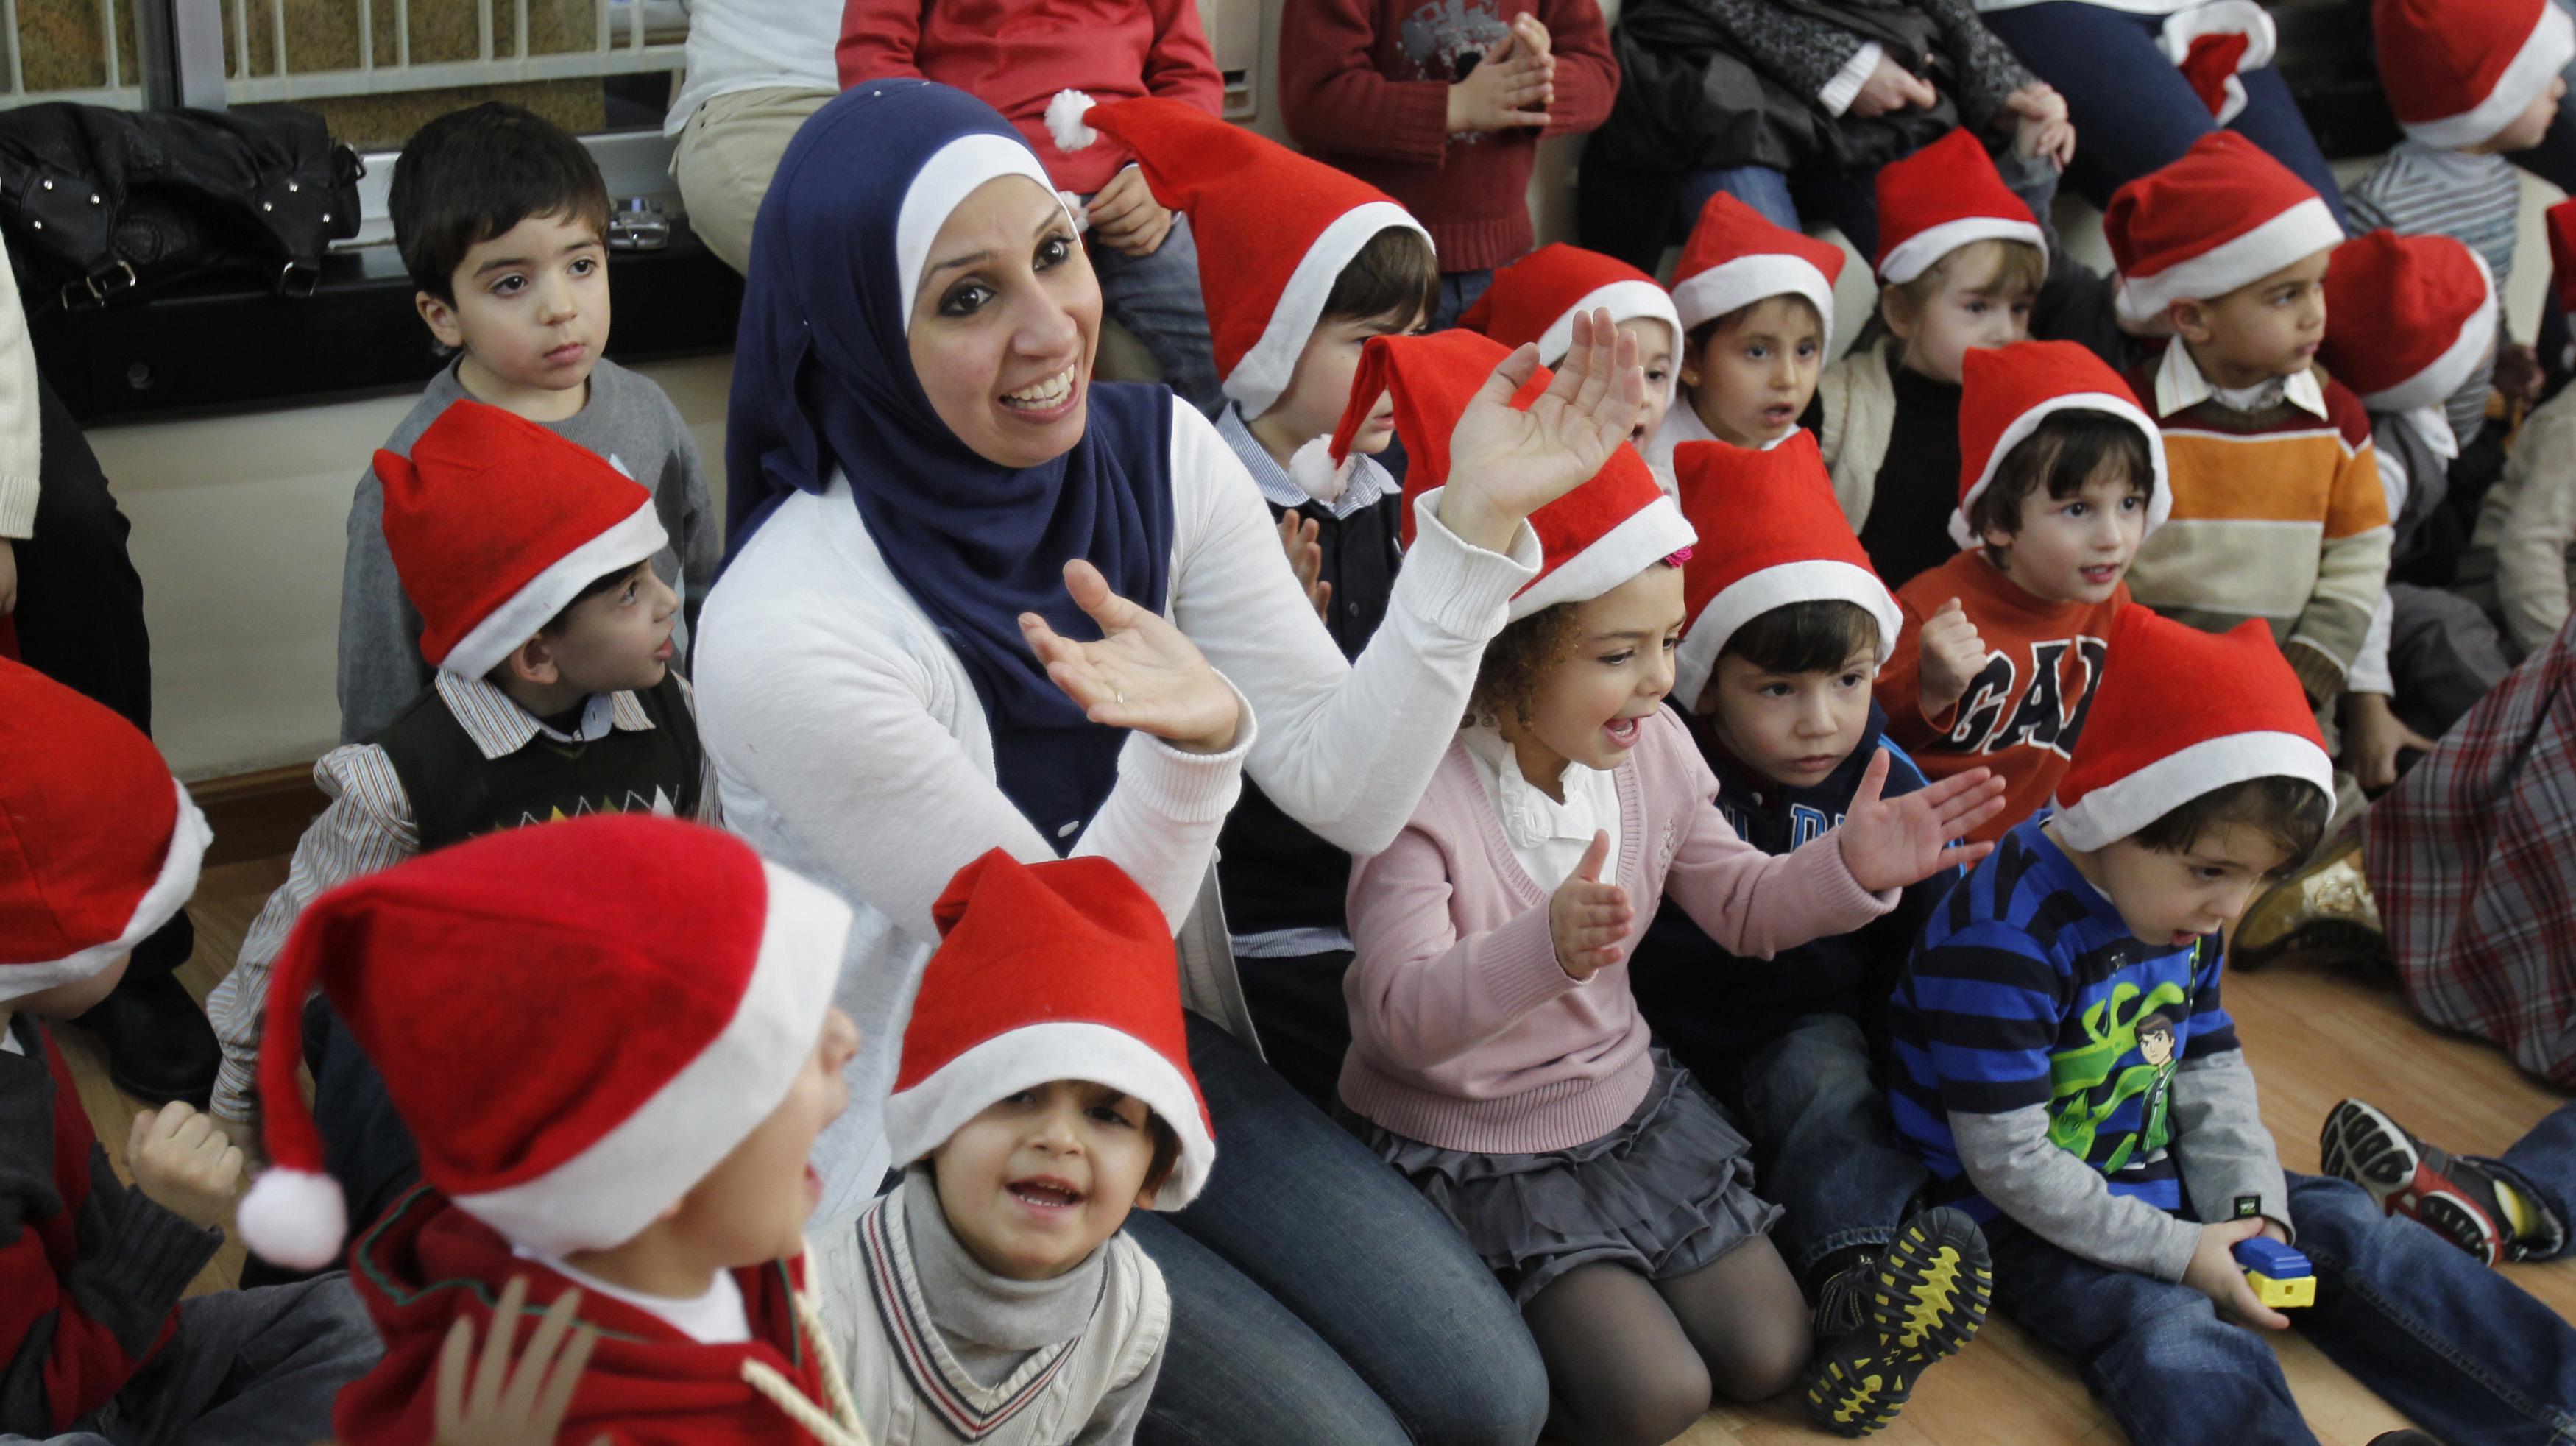 Do Muslims celebrate Christmas